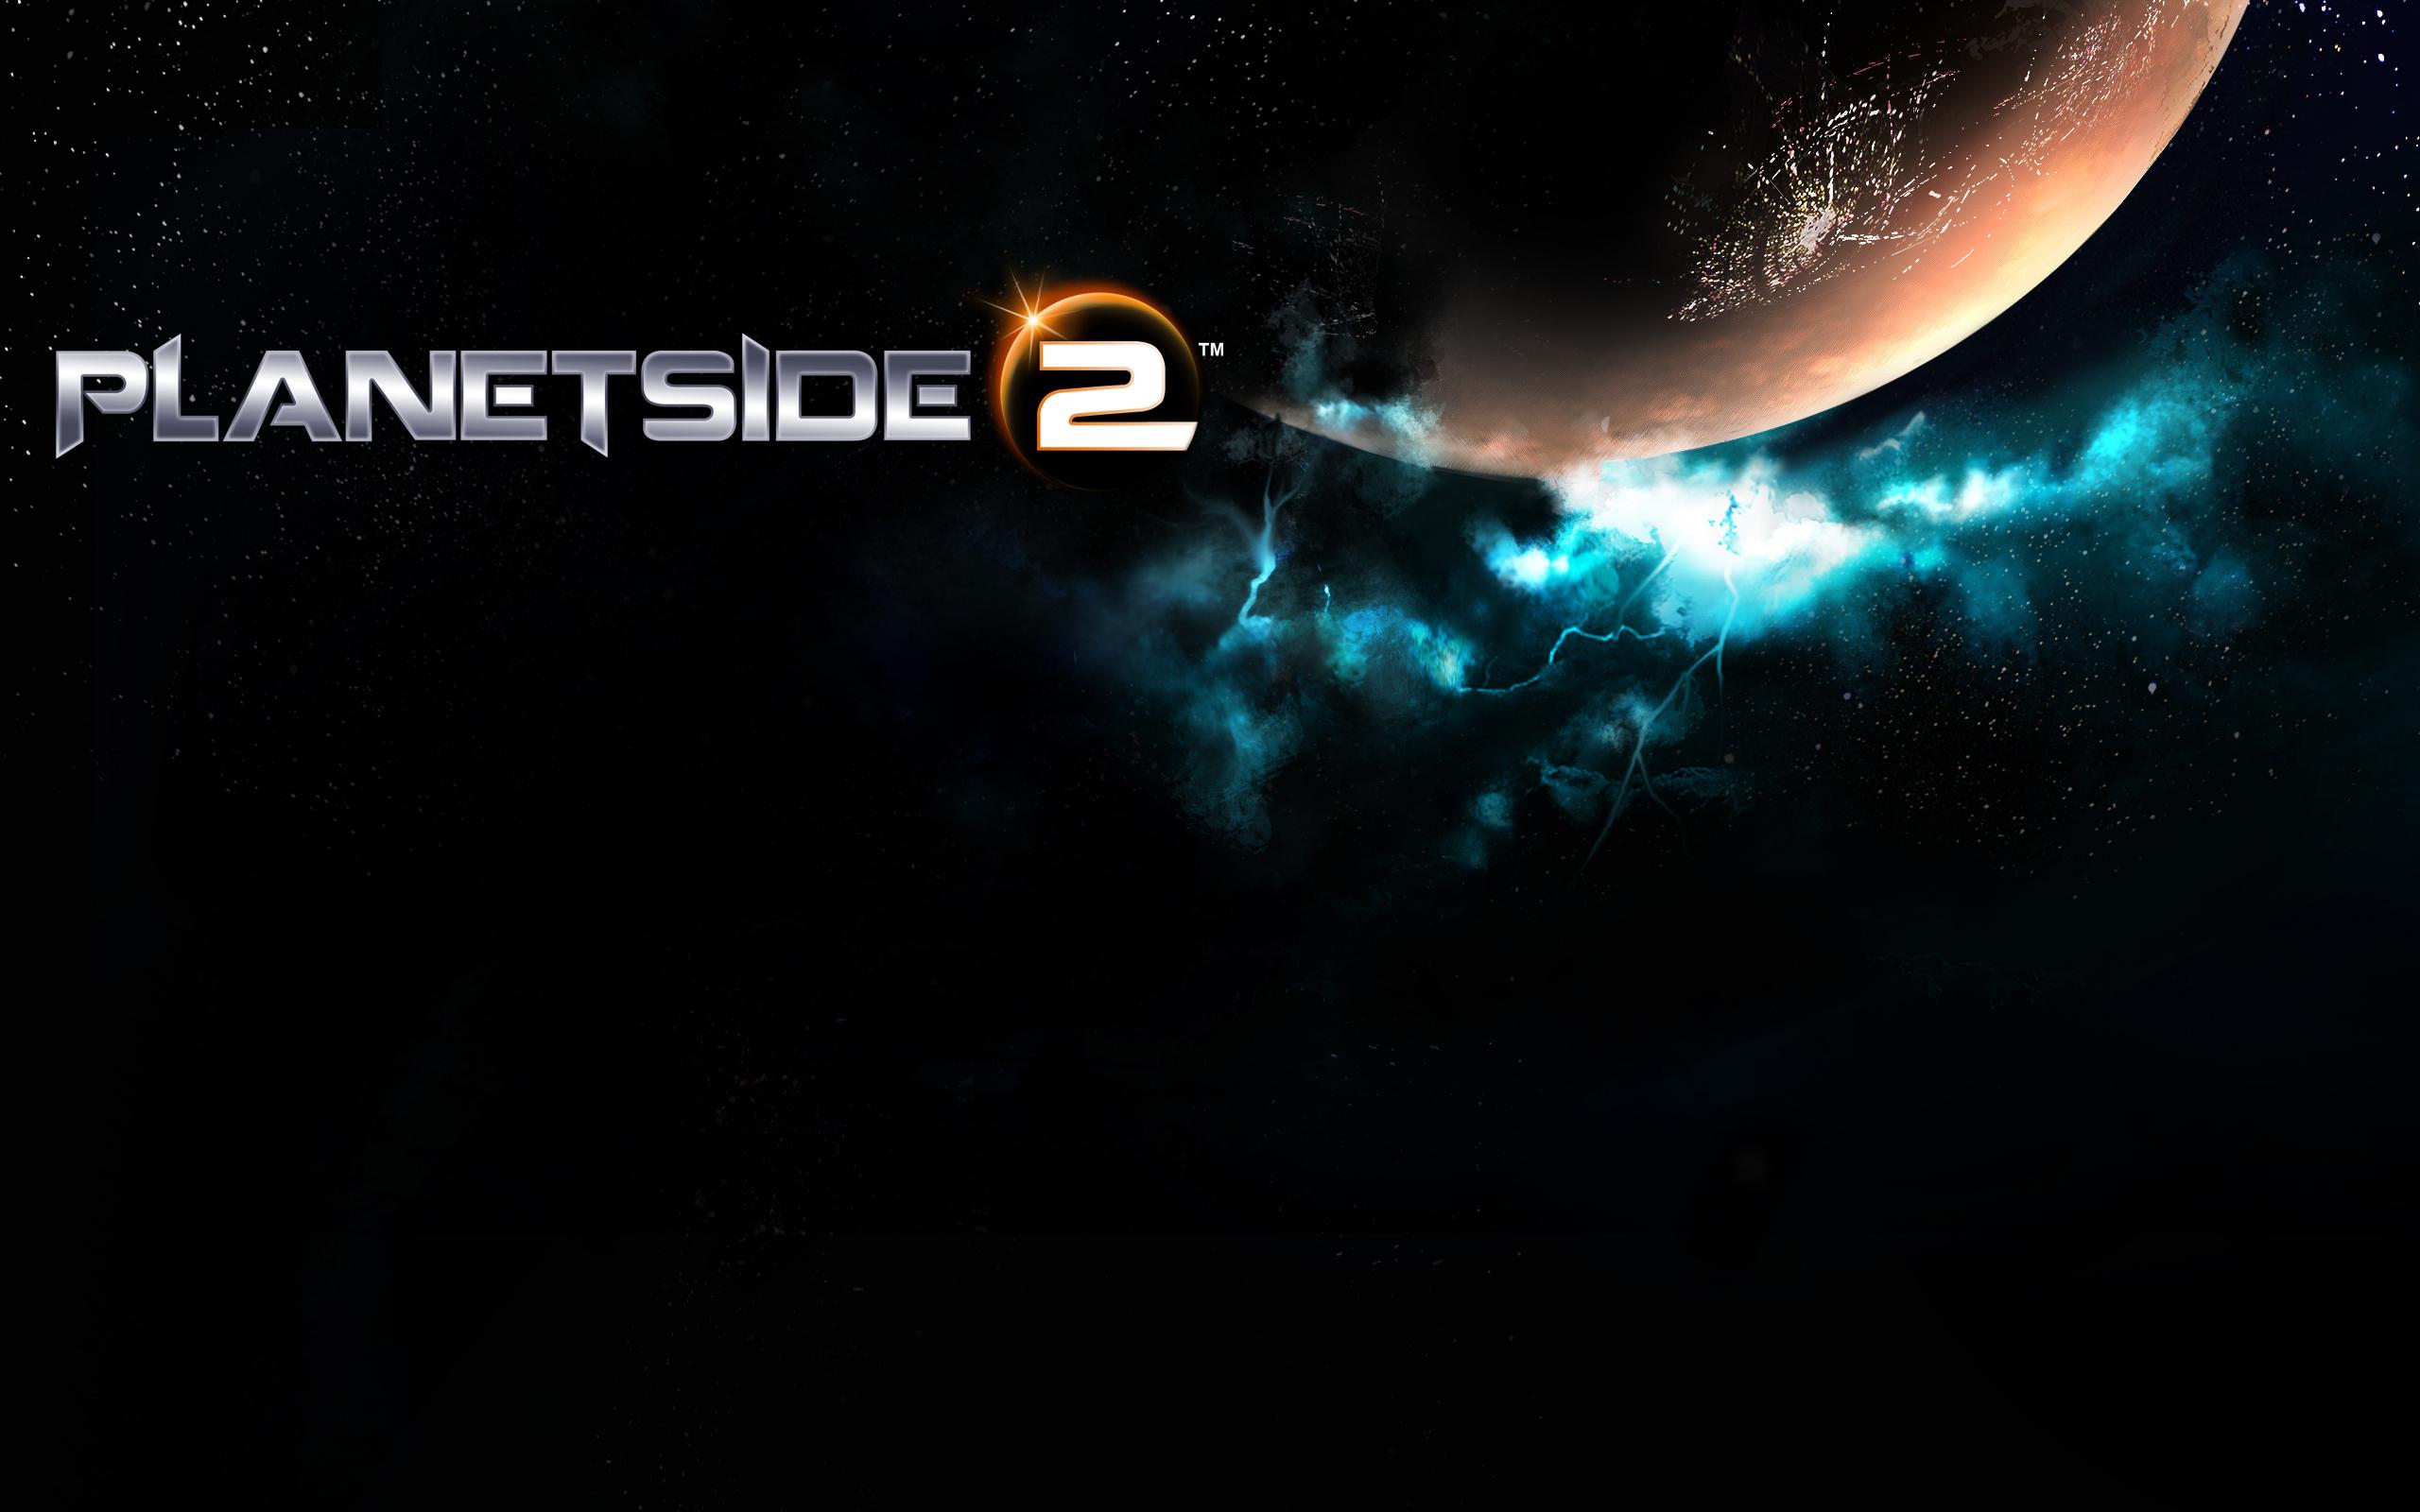 Planetside HD Wallpaper Background Image 2560x1600 ID319693 2560x1600